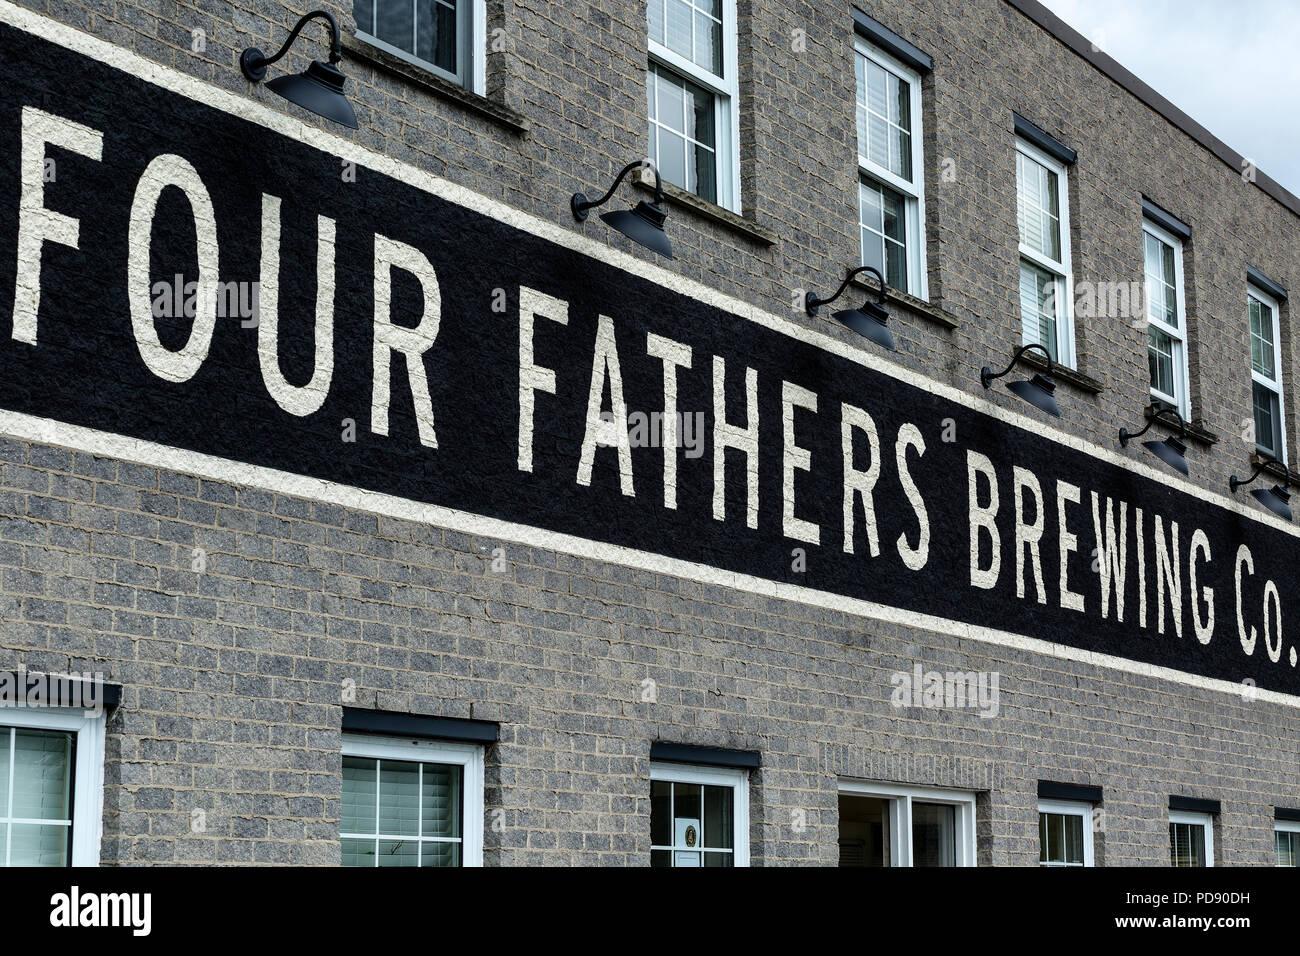 Four Fathers Brewing Cambridge (Hespeler) Ontario Canada. - Stock Image